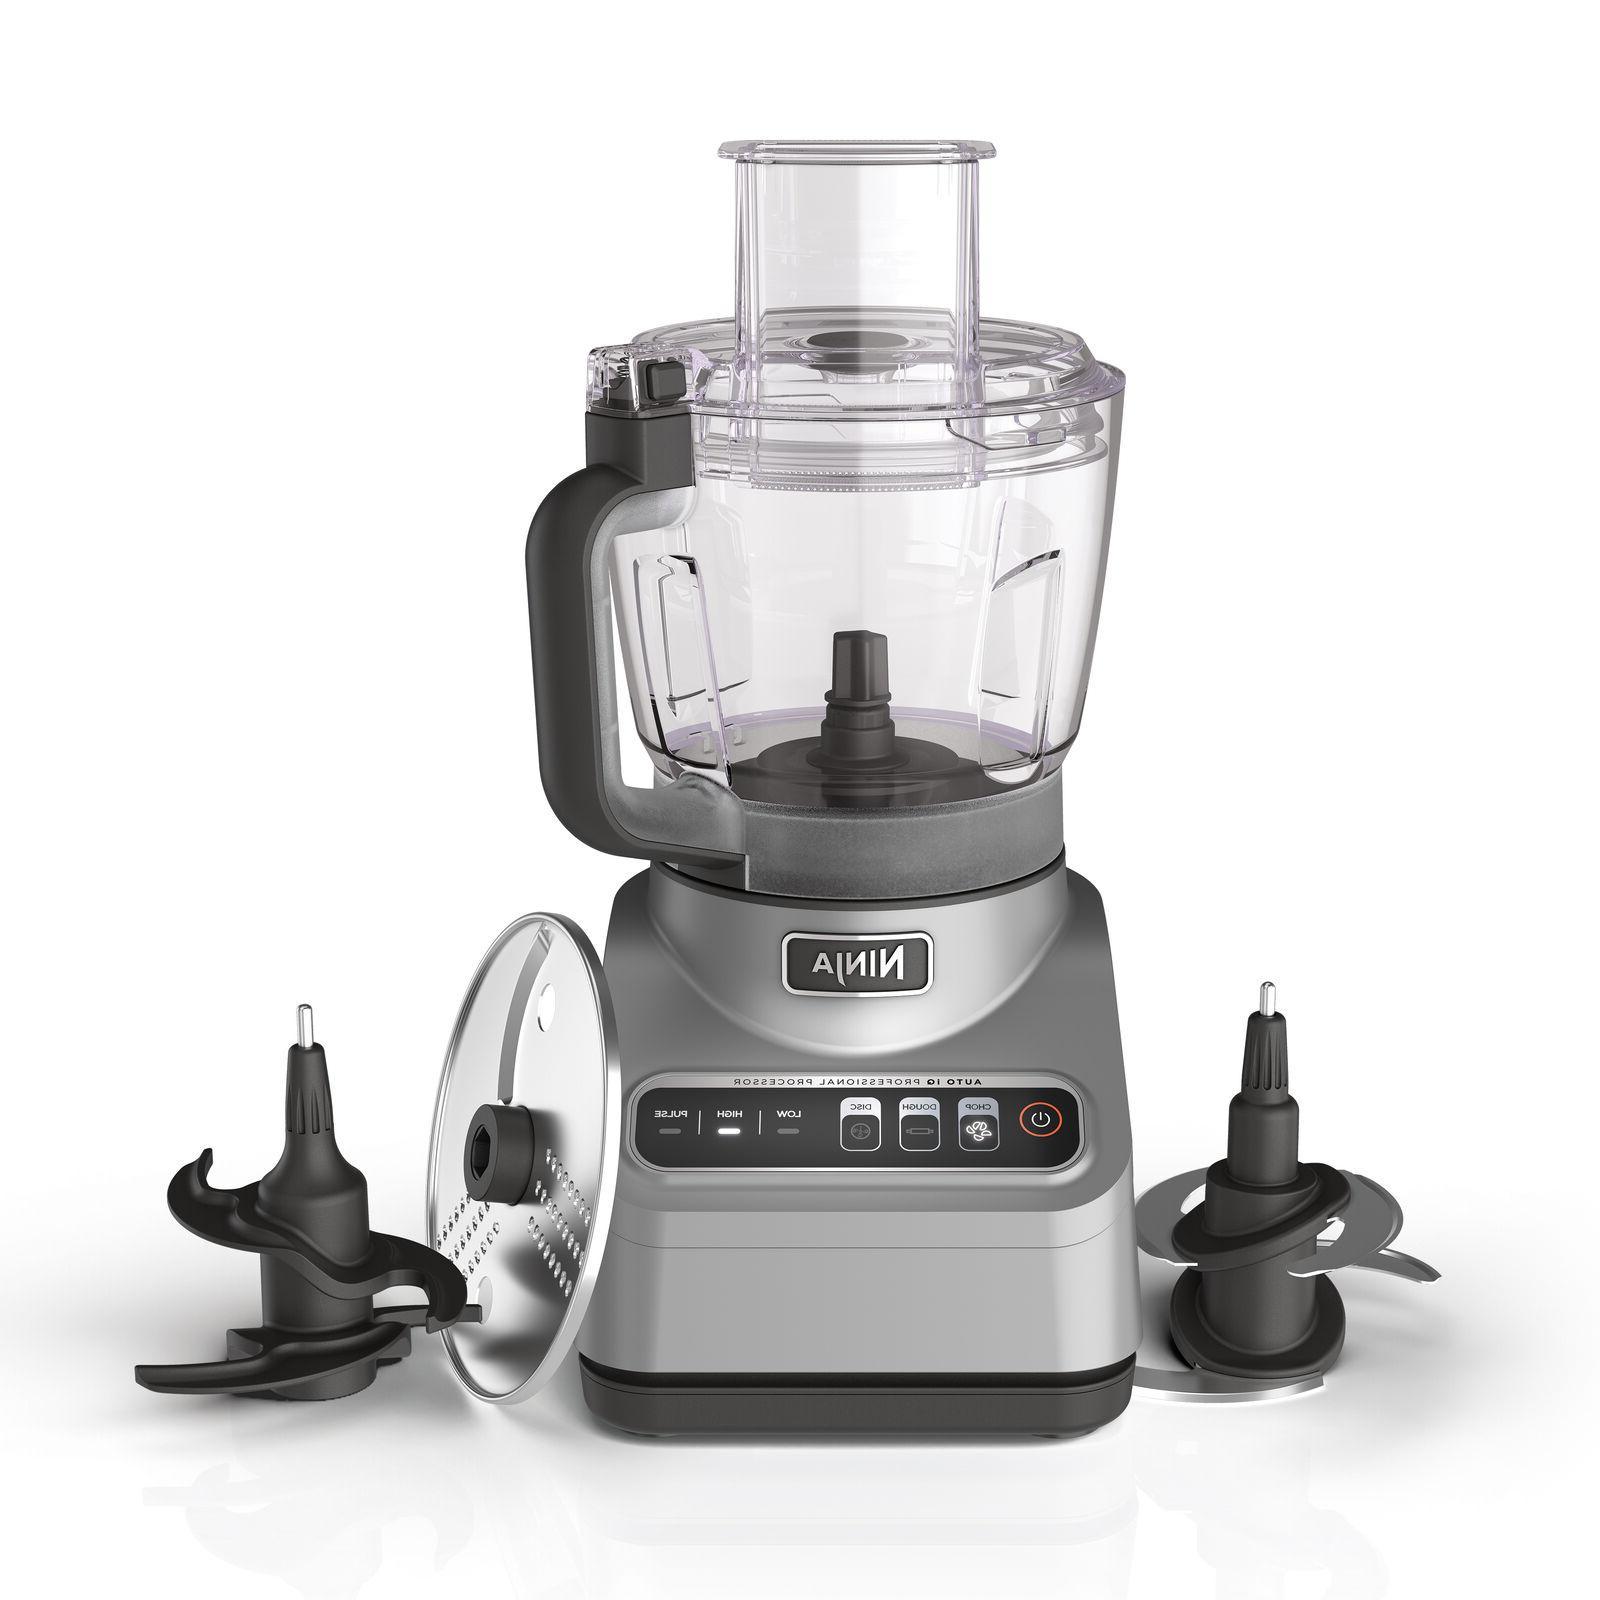 professional food processor 850 watts 9 cup